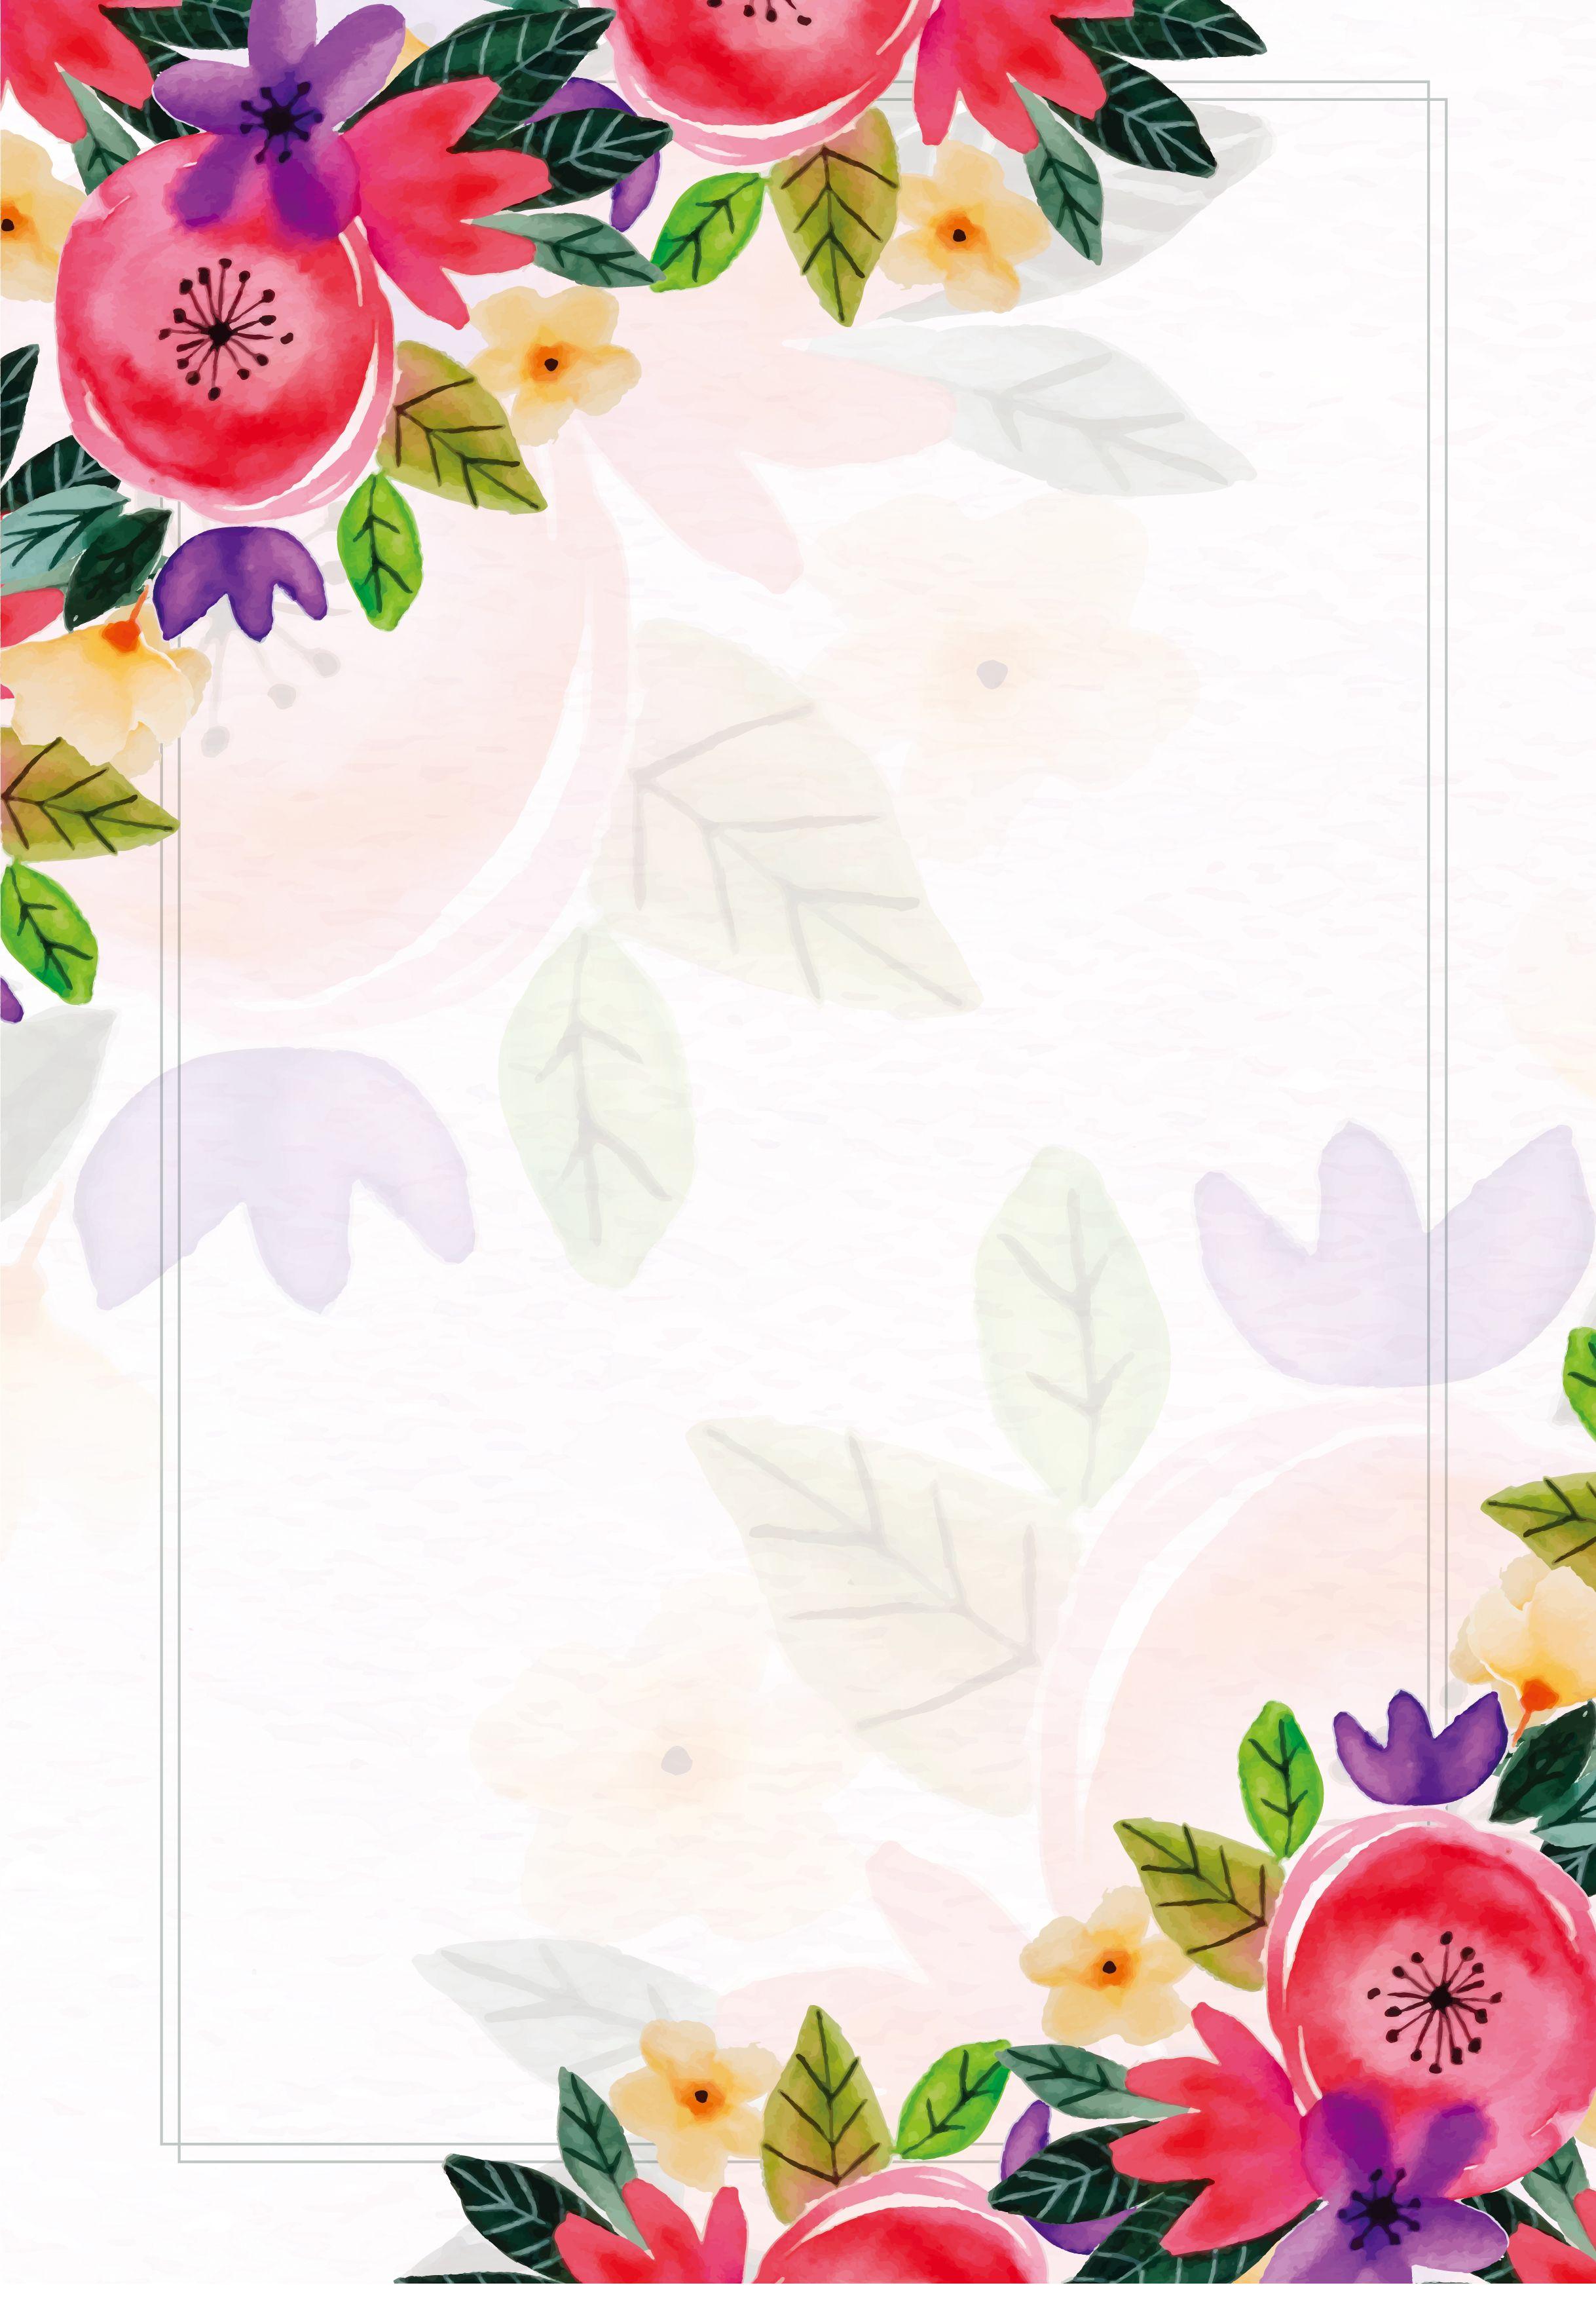 Simple Flowers Fresh Poster Background Con Imagenes Fondos De